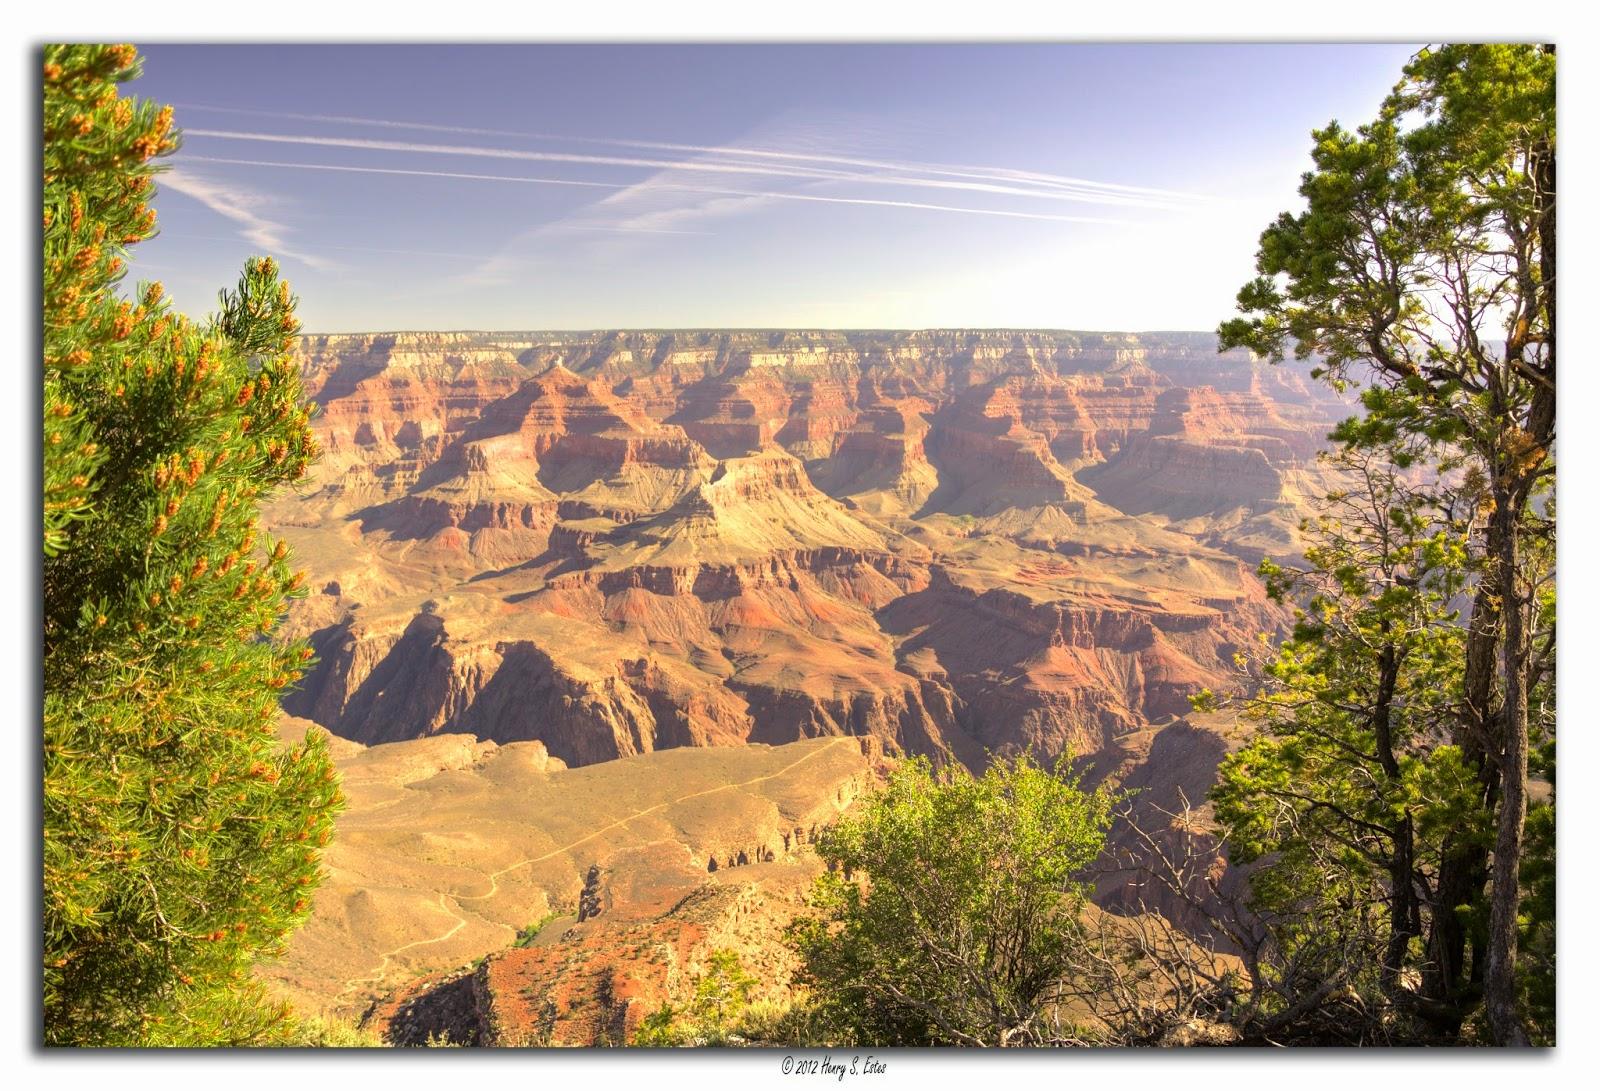 Spring at the Canyon